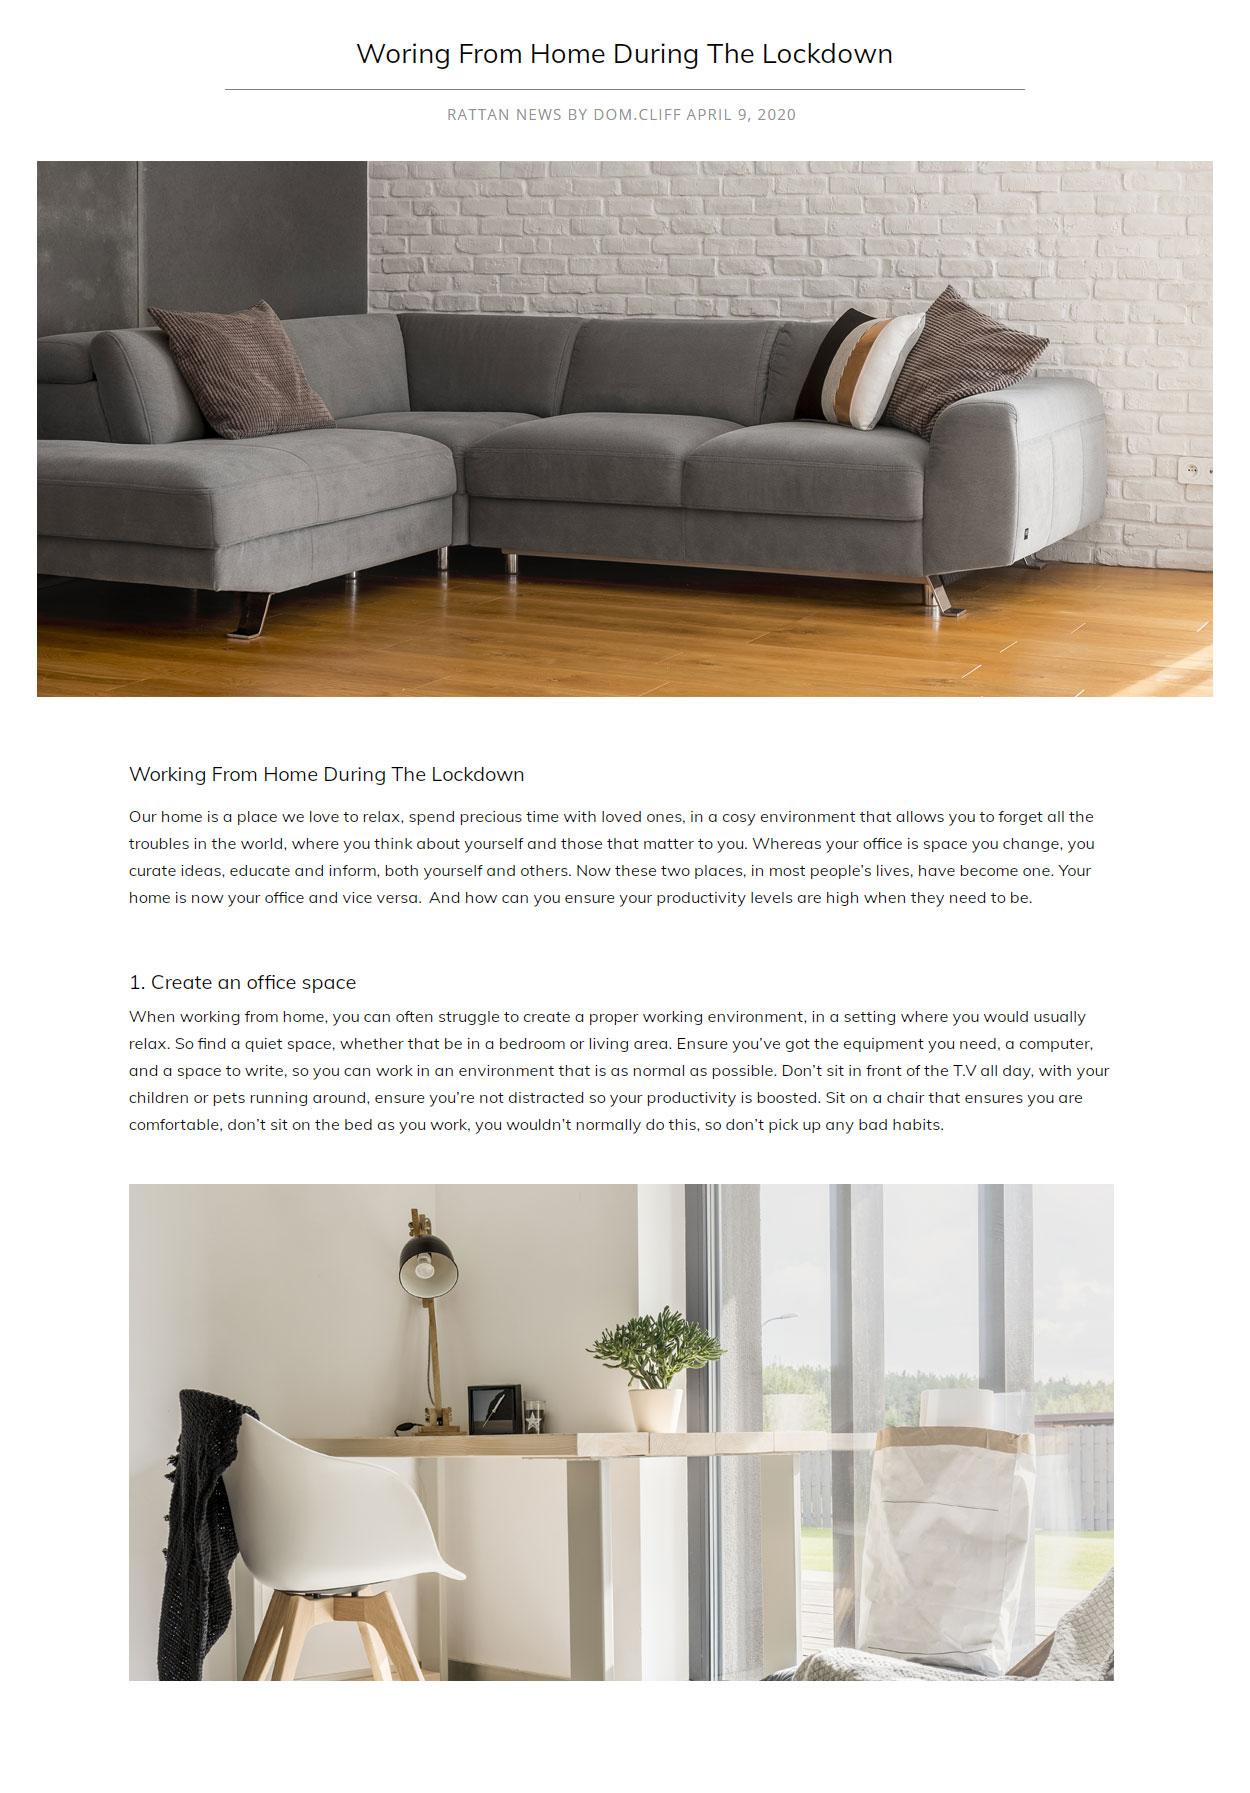 portfolio-detail-rattandirect-img-05